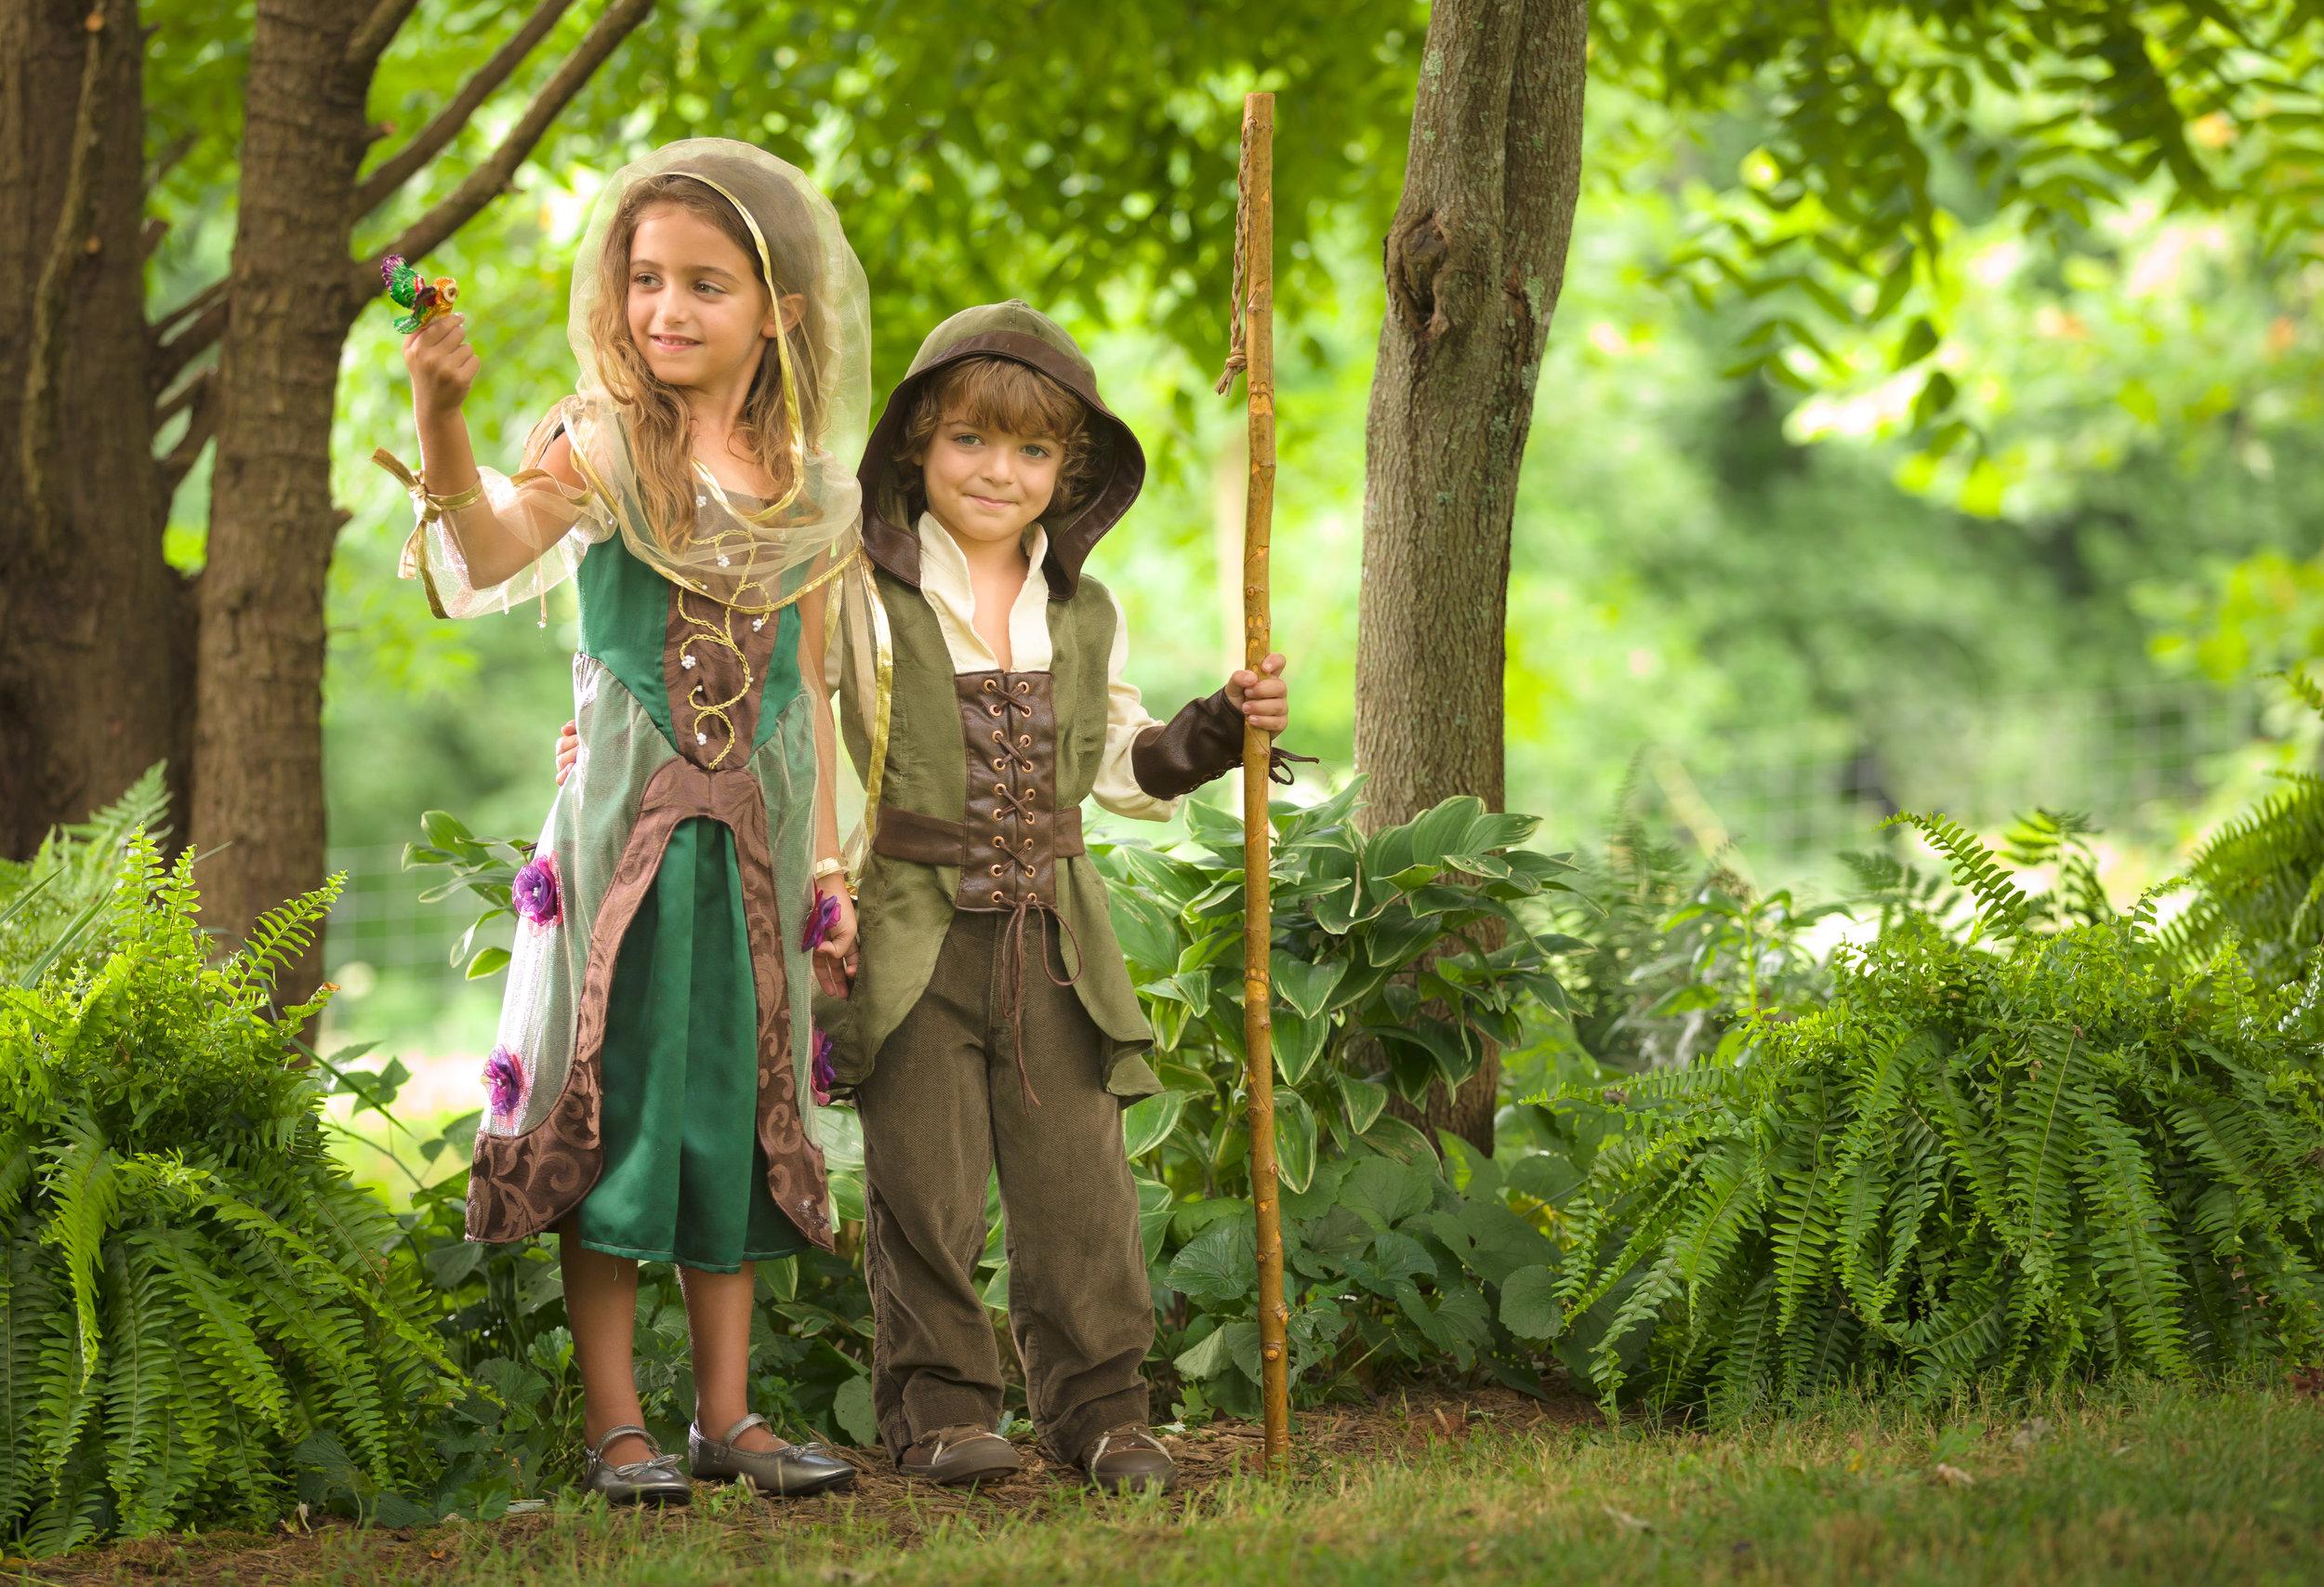 Portfoilo-Kids-013.jpg